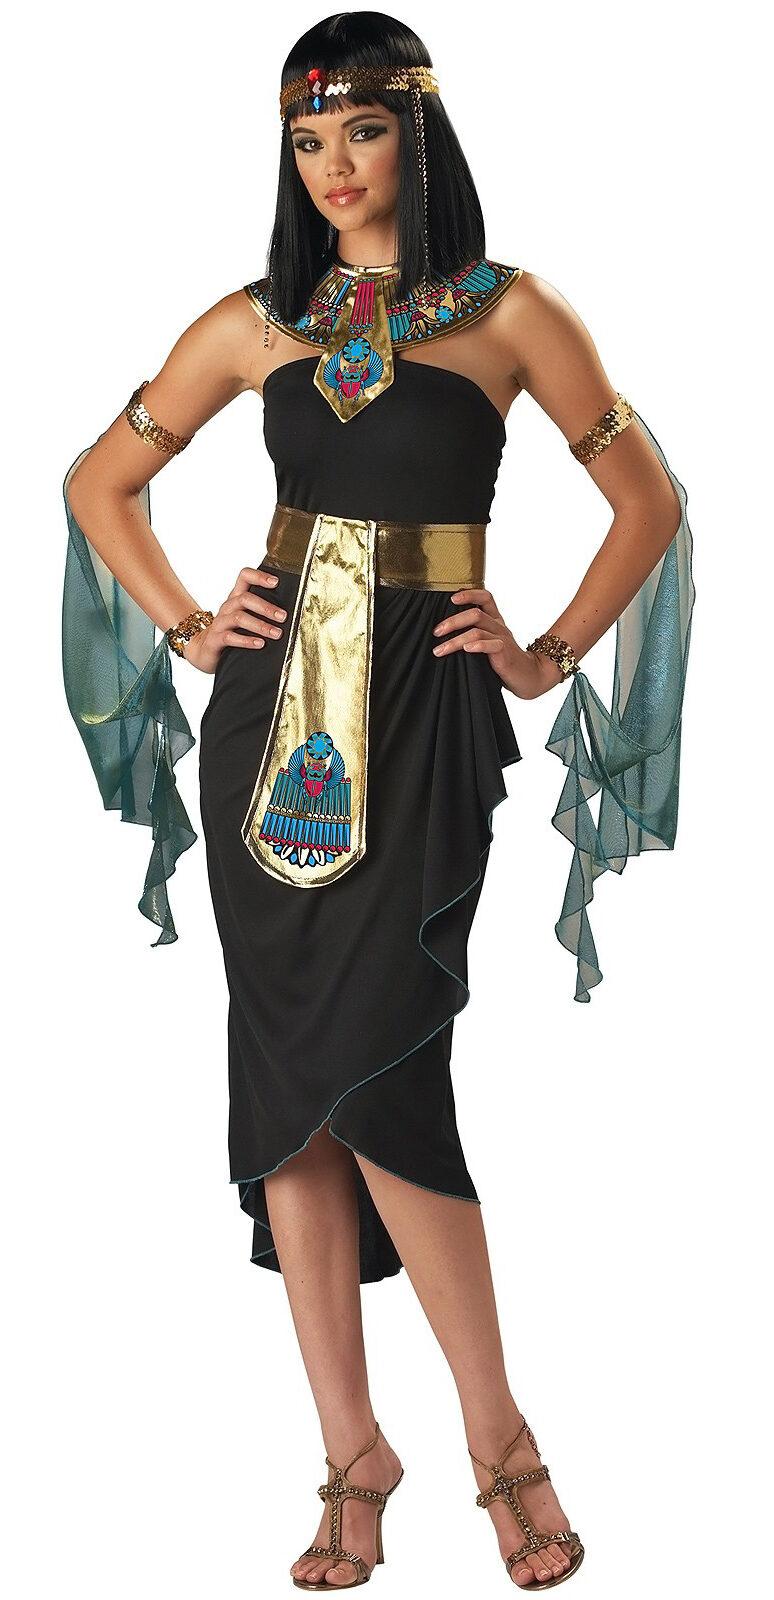 Womens Cleopatra Adult Costume  sc 1 st  Mr. Costumes & Womens Cleopatra Adult Costume - Mr. Costumes